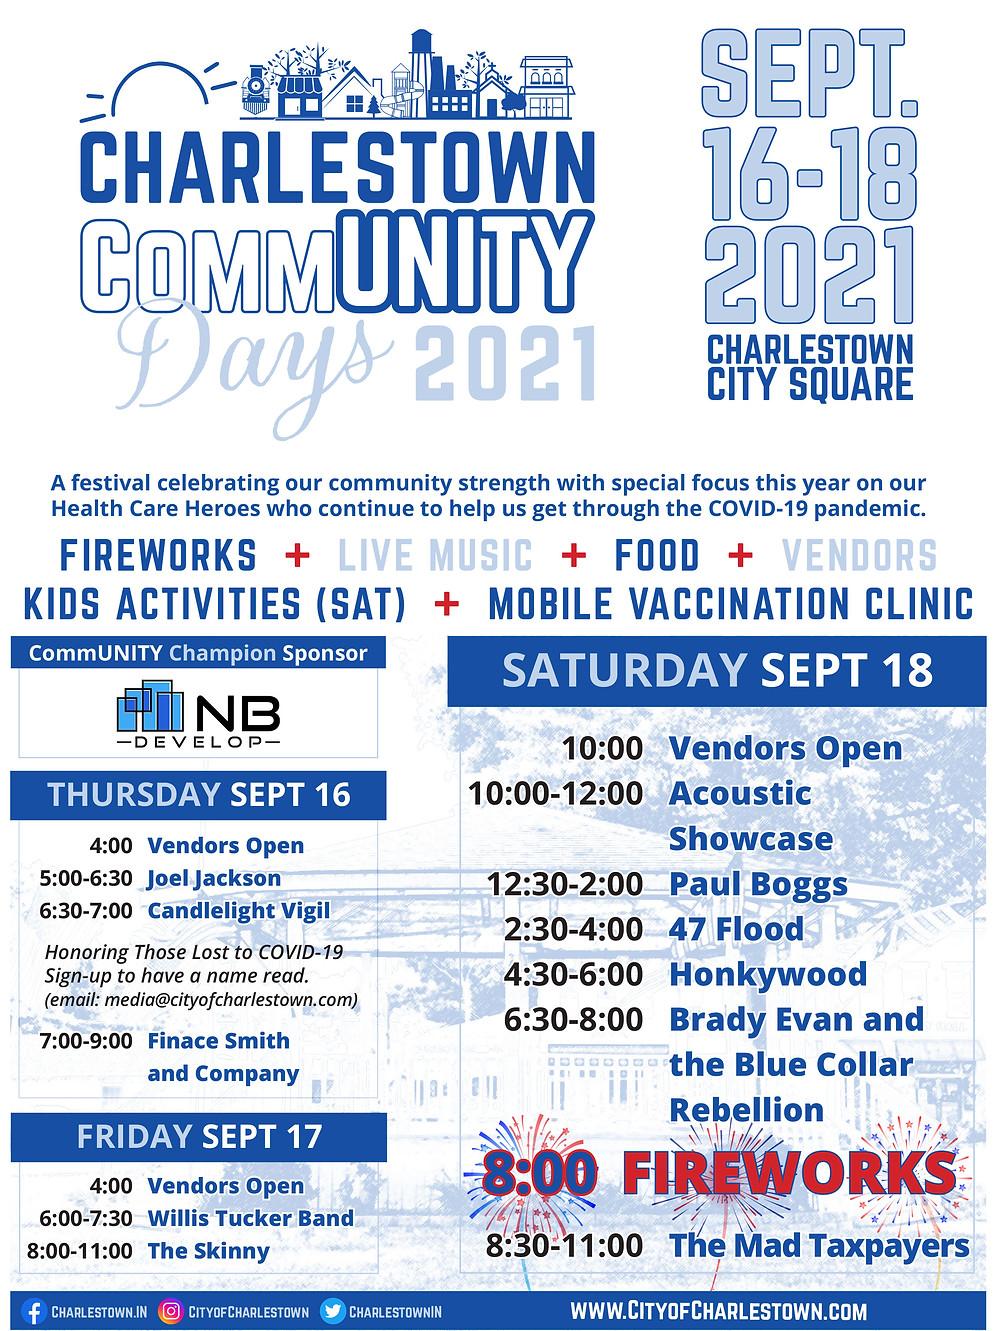 Charlestown Community Days 2021